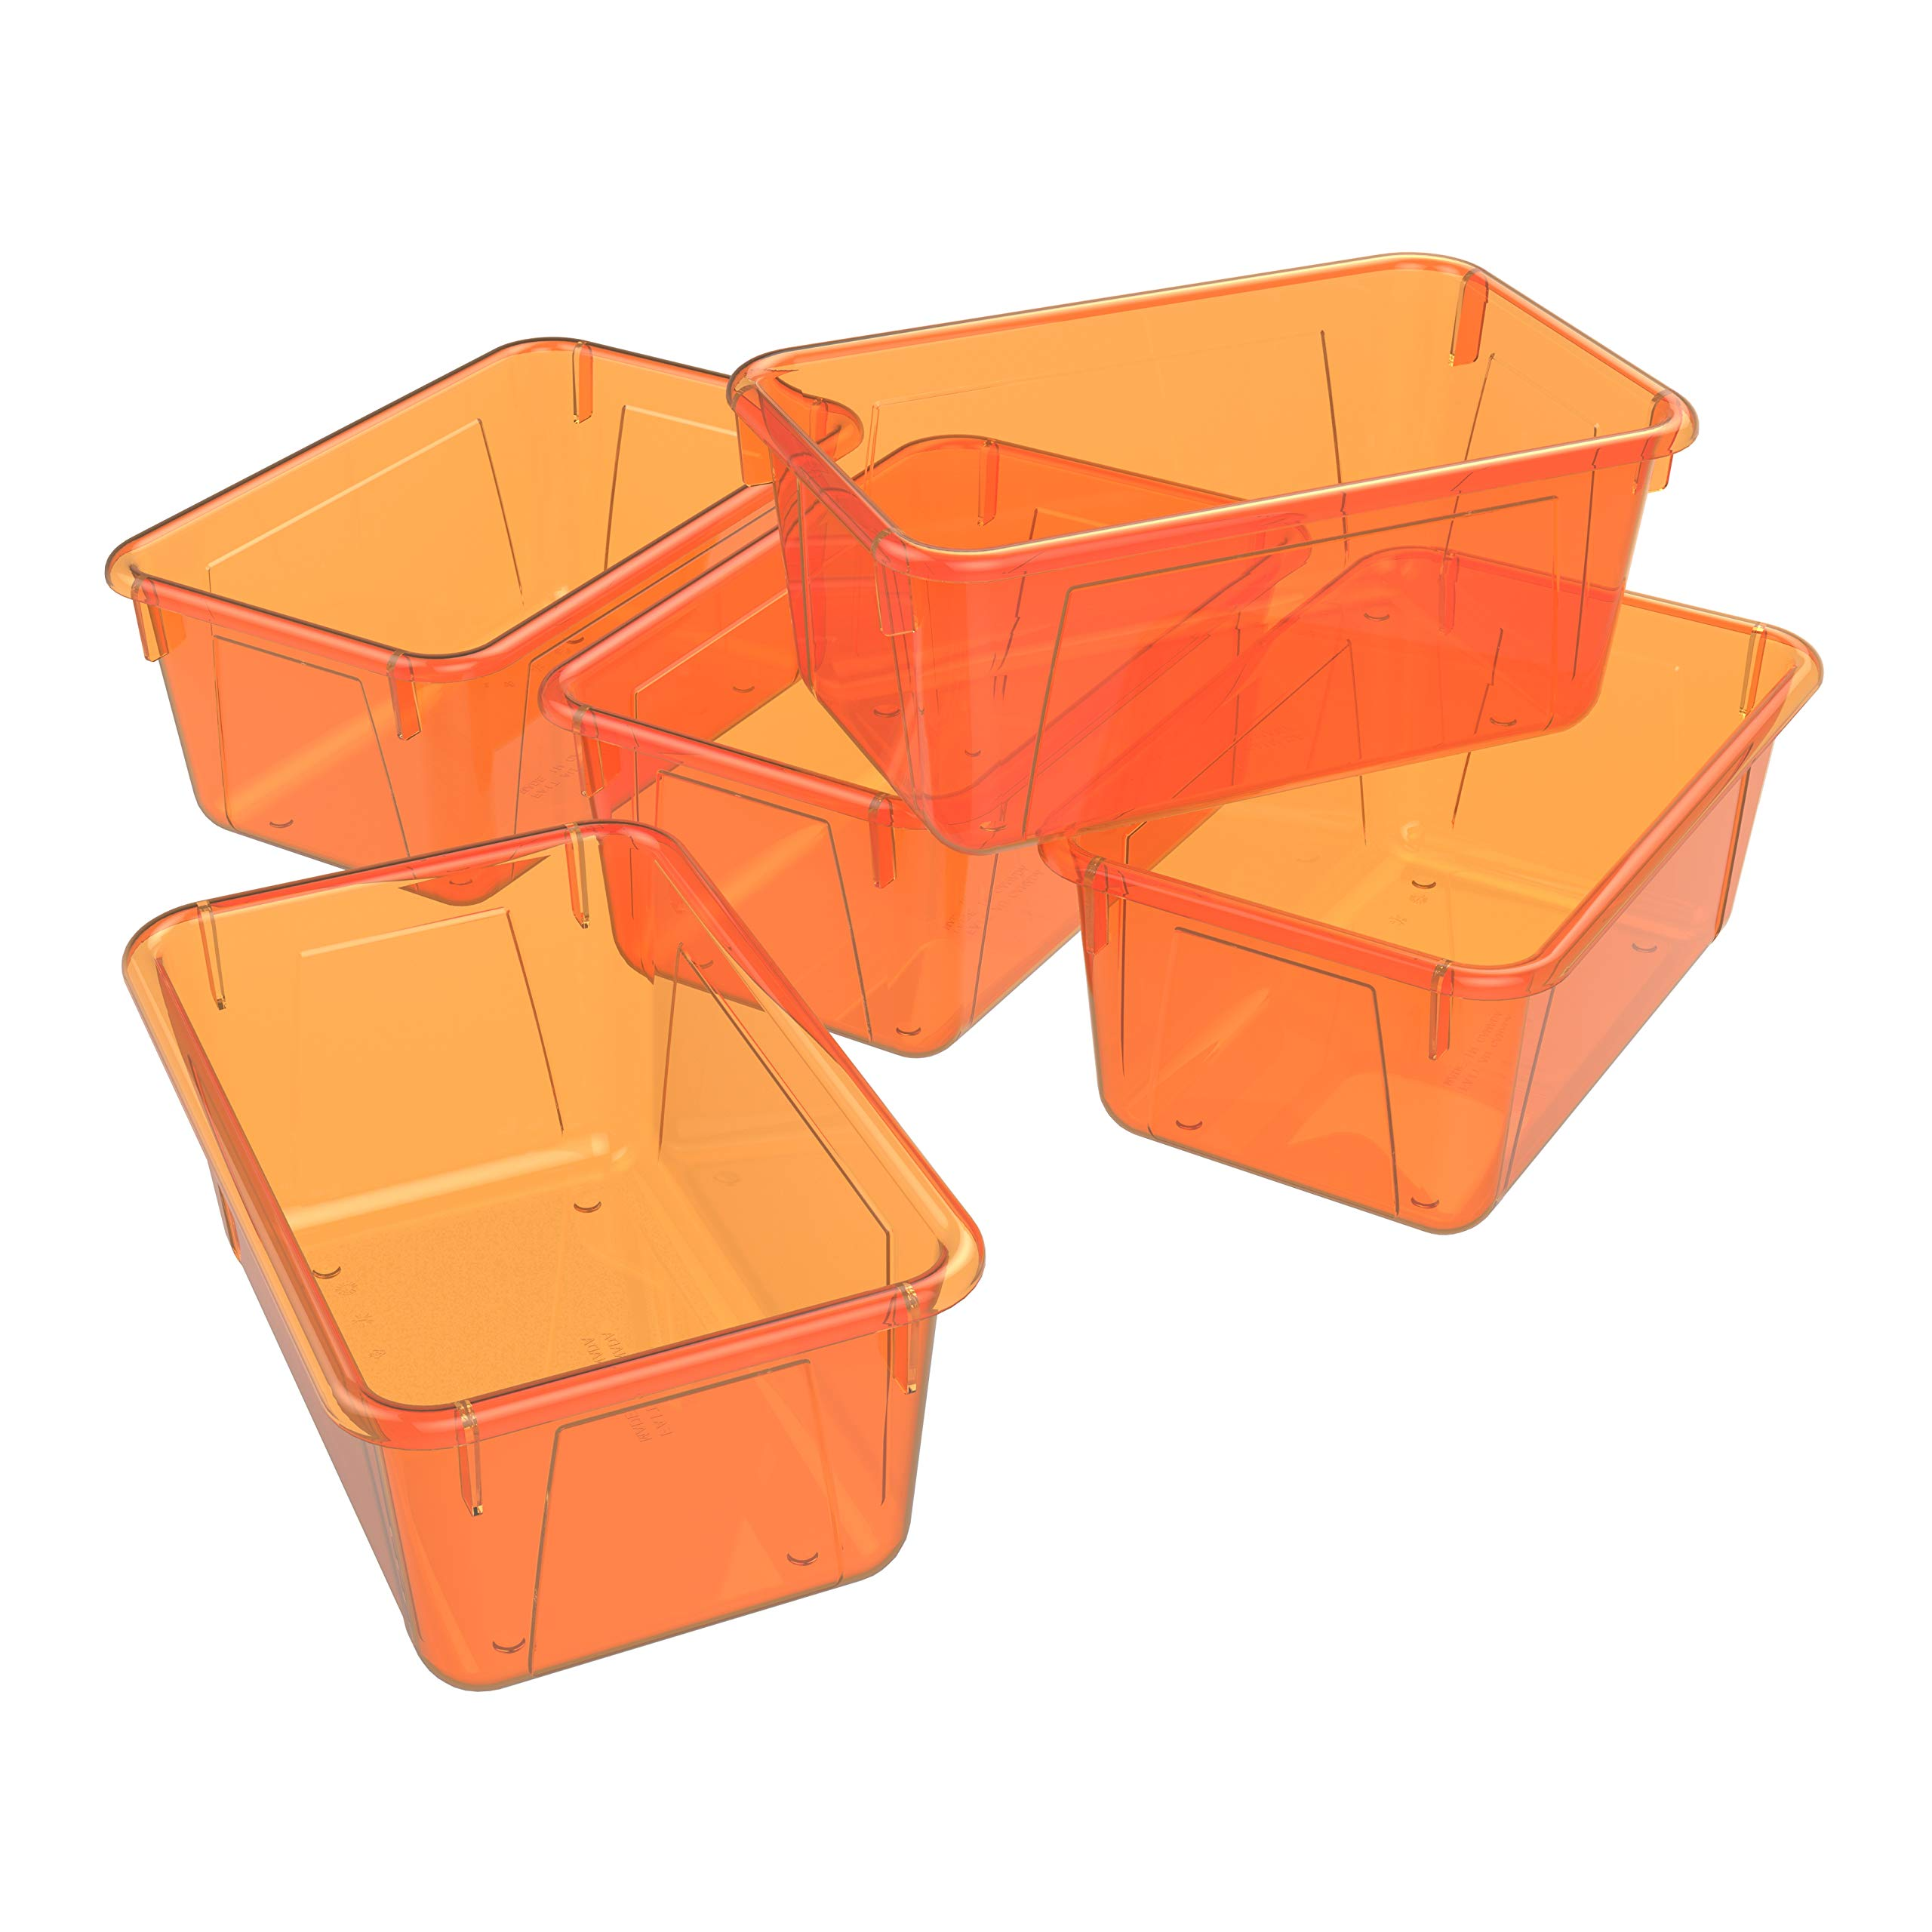 Storex Small Cubby Bin, 12.2 x 7.8 x 5.1 Inches, Candy Orange, 5-Pack (62479U05C)